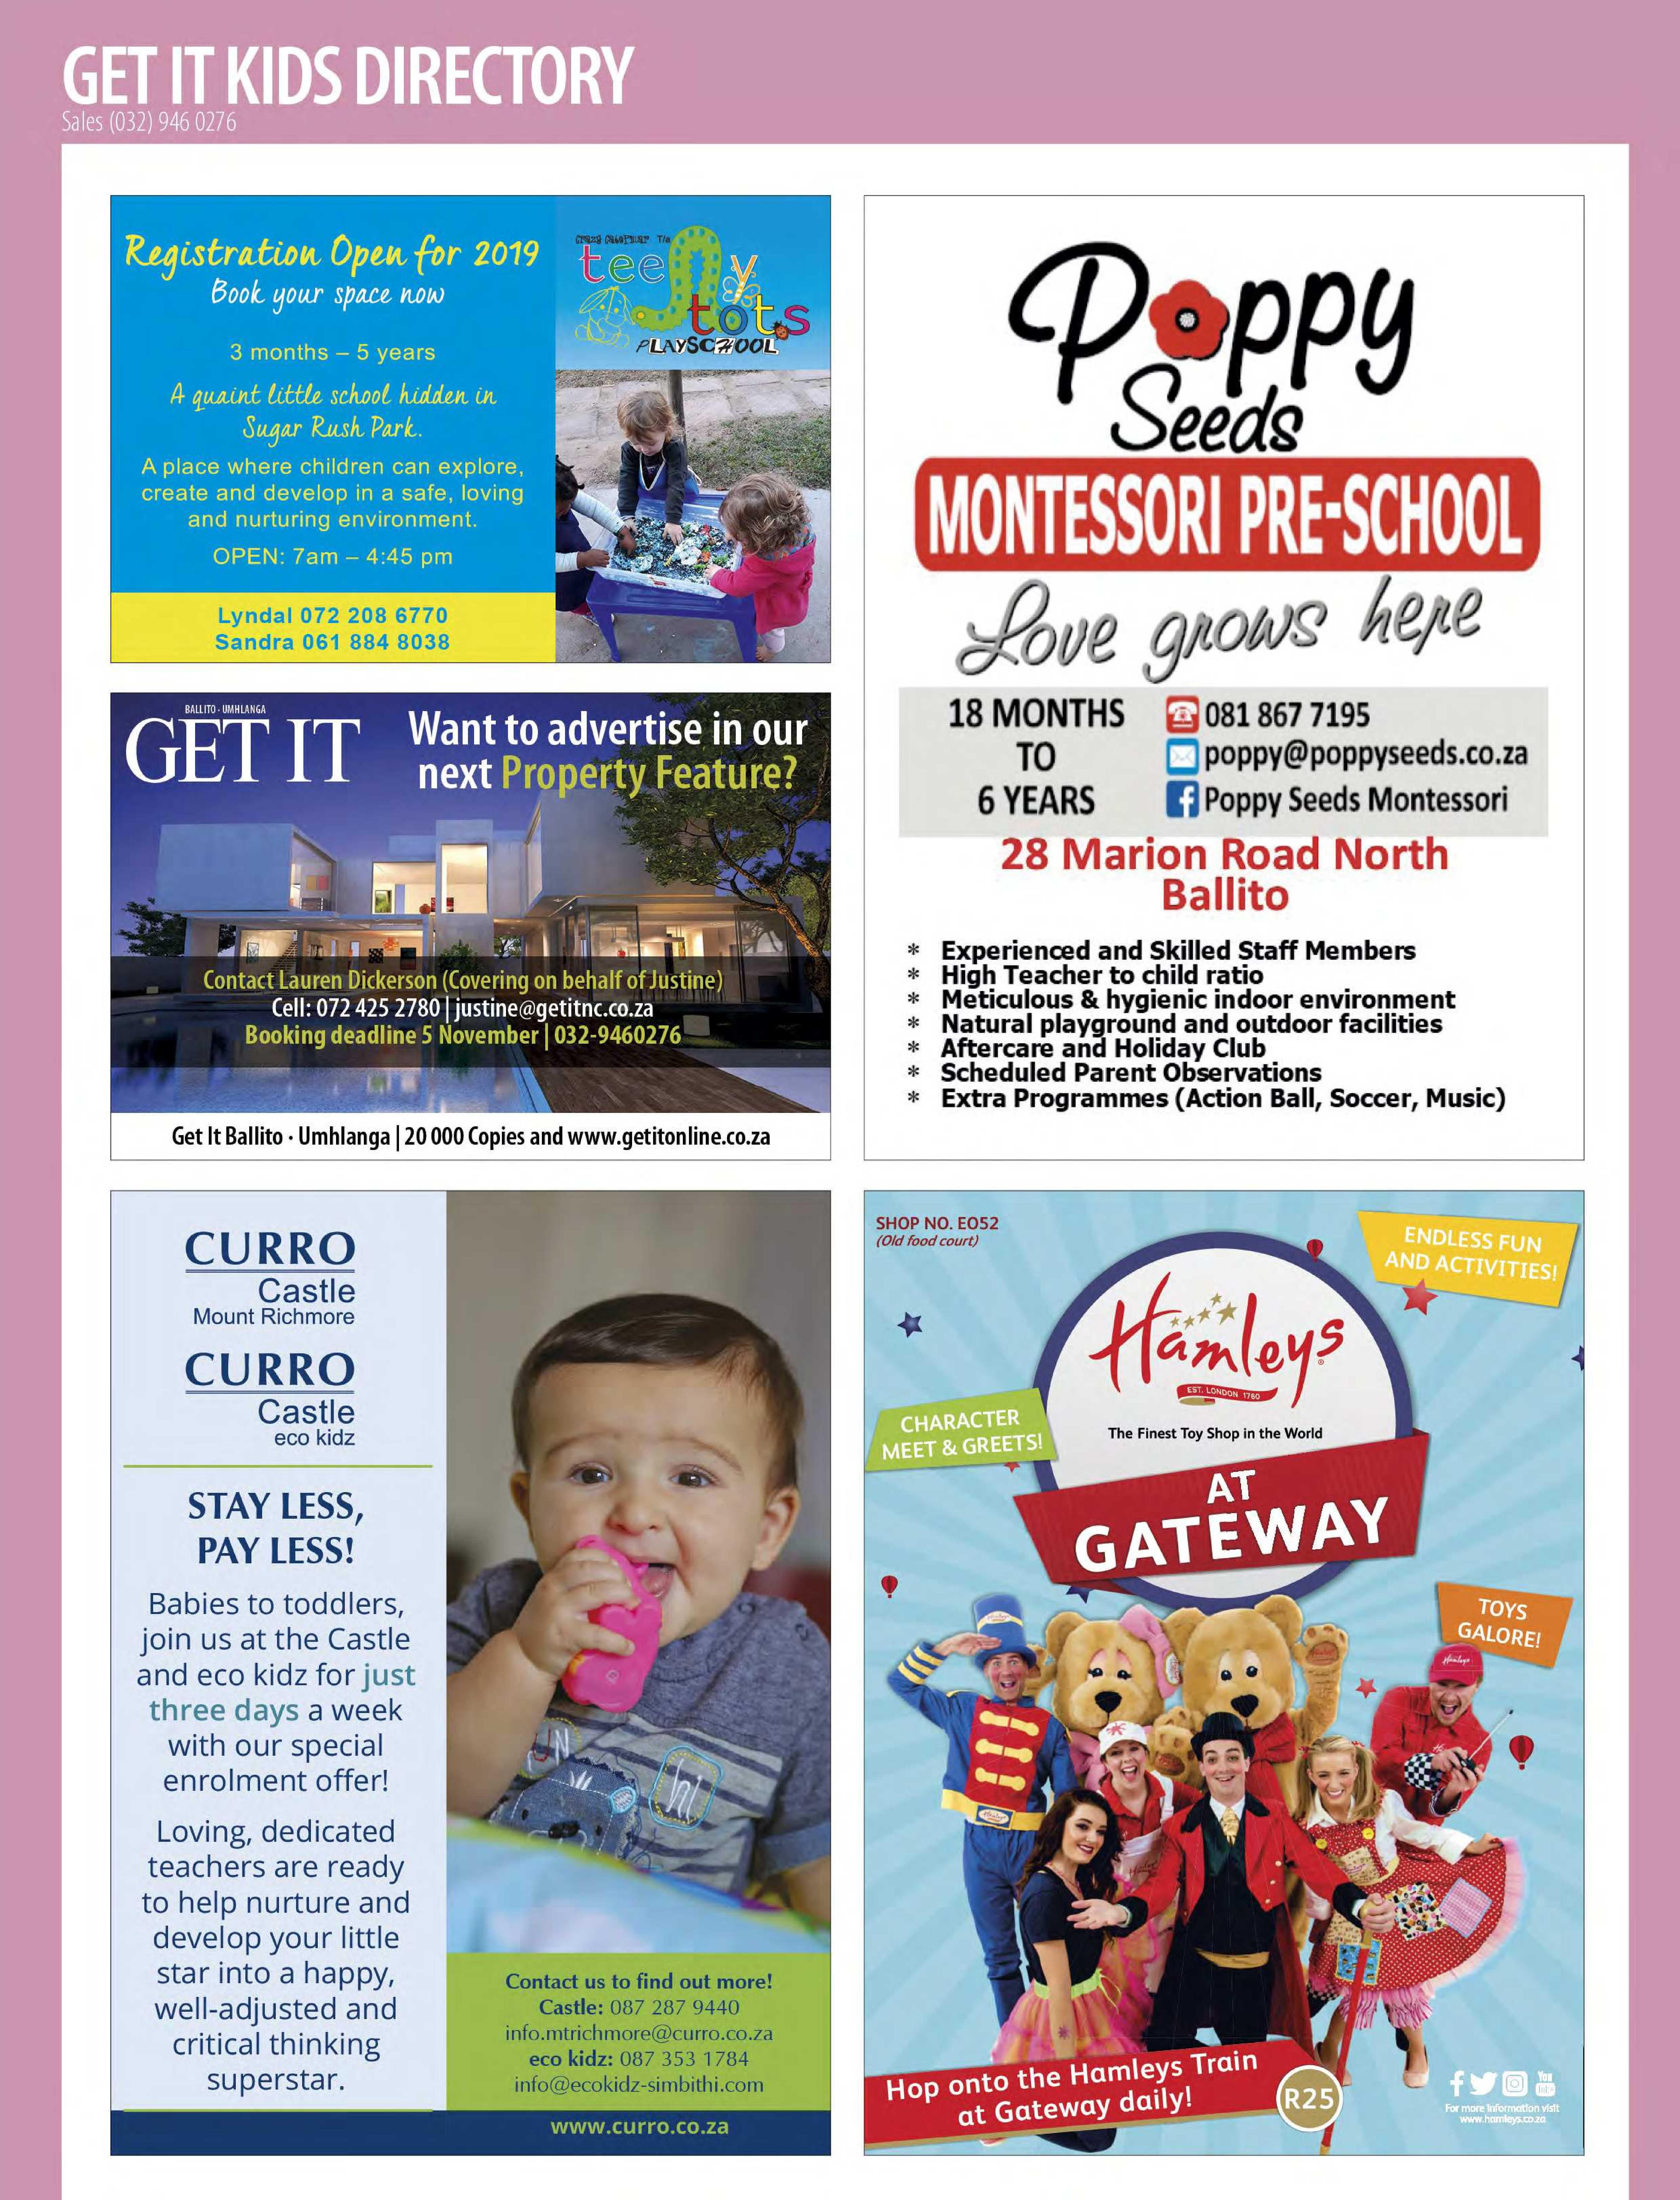 get-magazine-ballitoumhlanga-november-2018-epapers-page-68